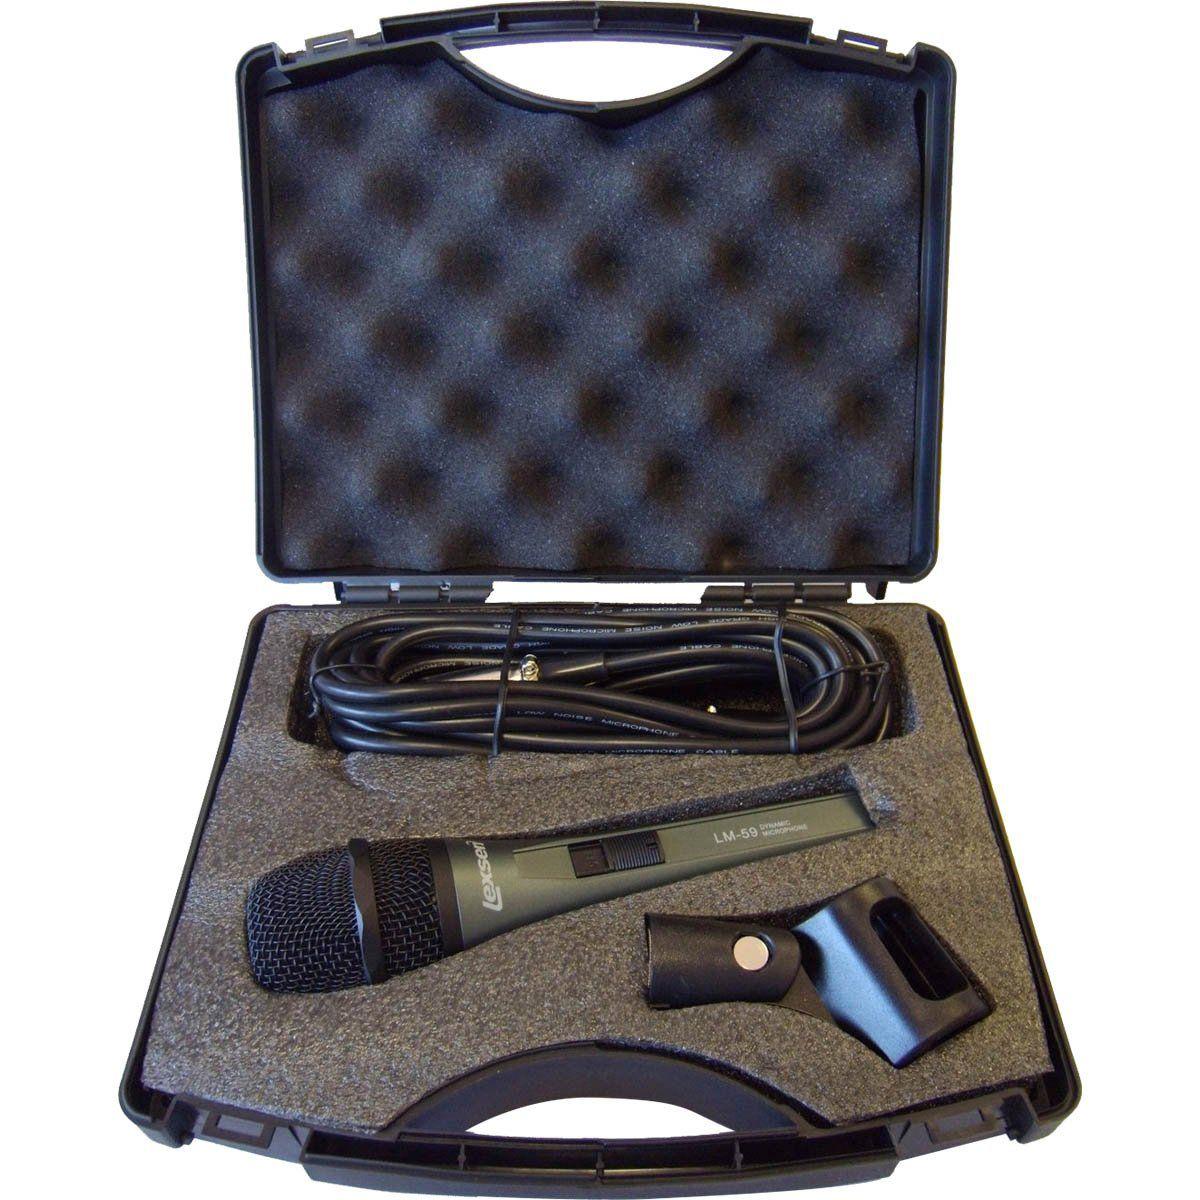 Lexsen LM 59 Microfone Cardioide Lexsen LM-59 fácil de Transportar